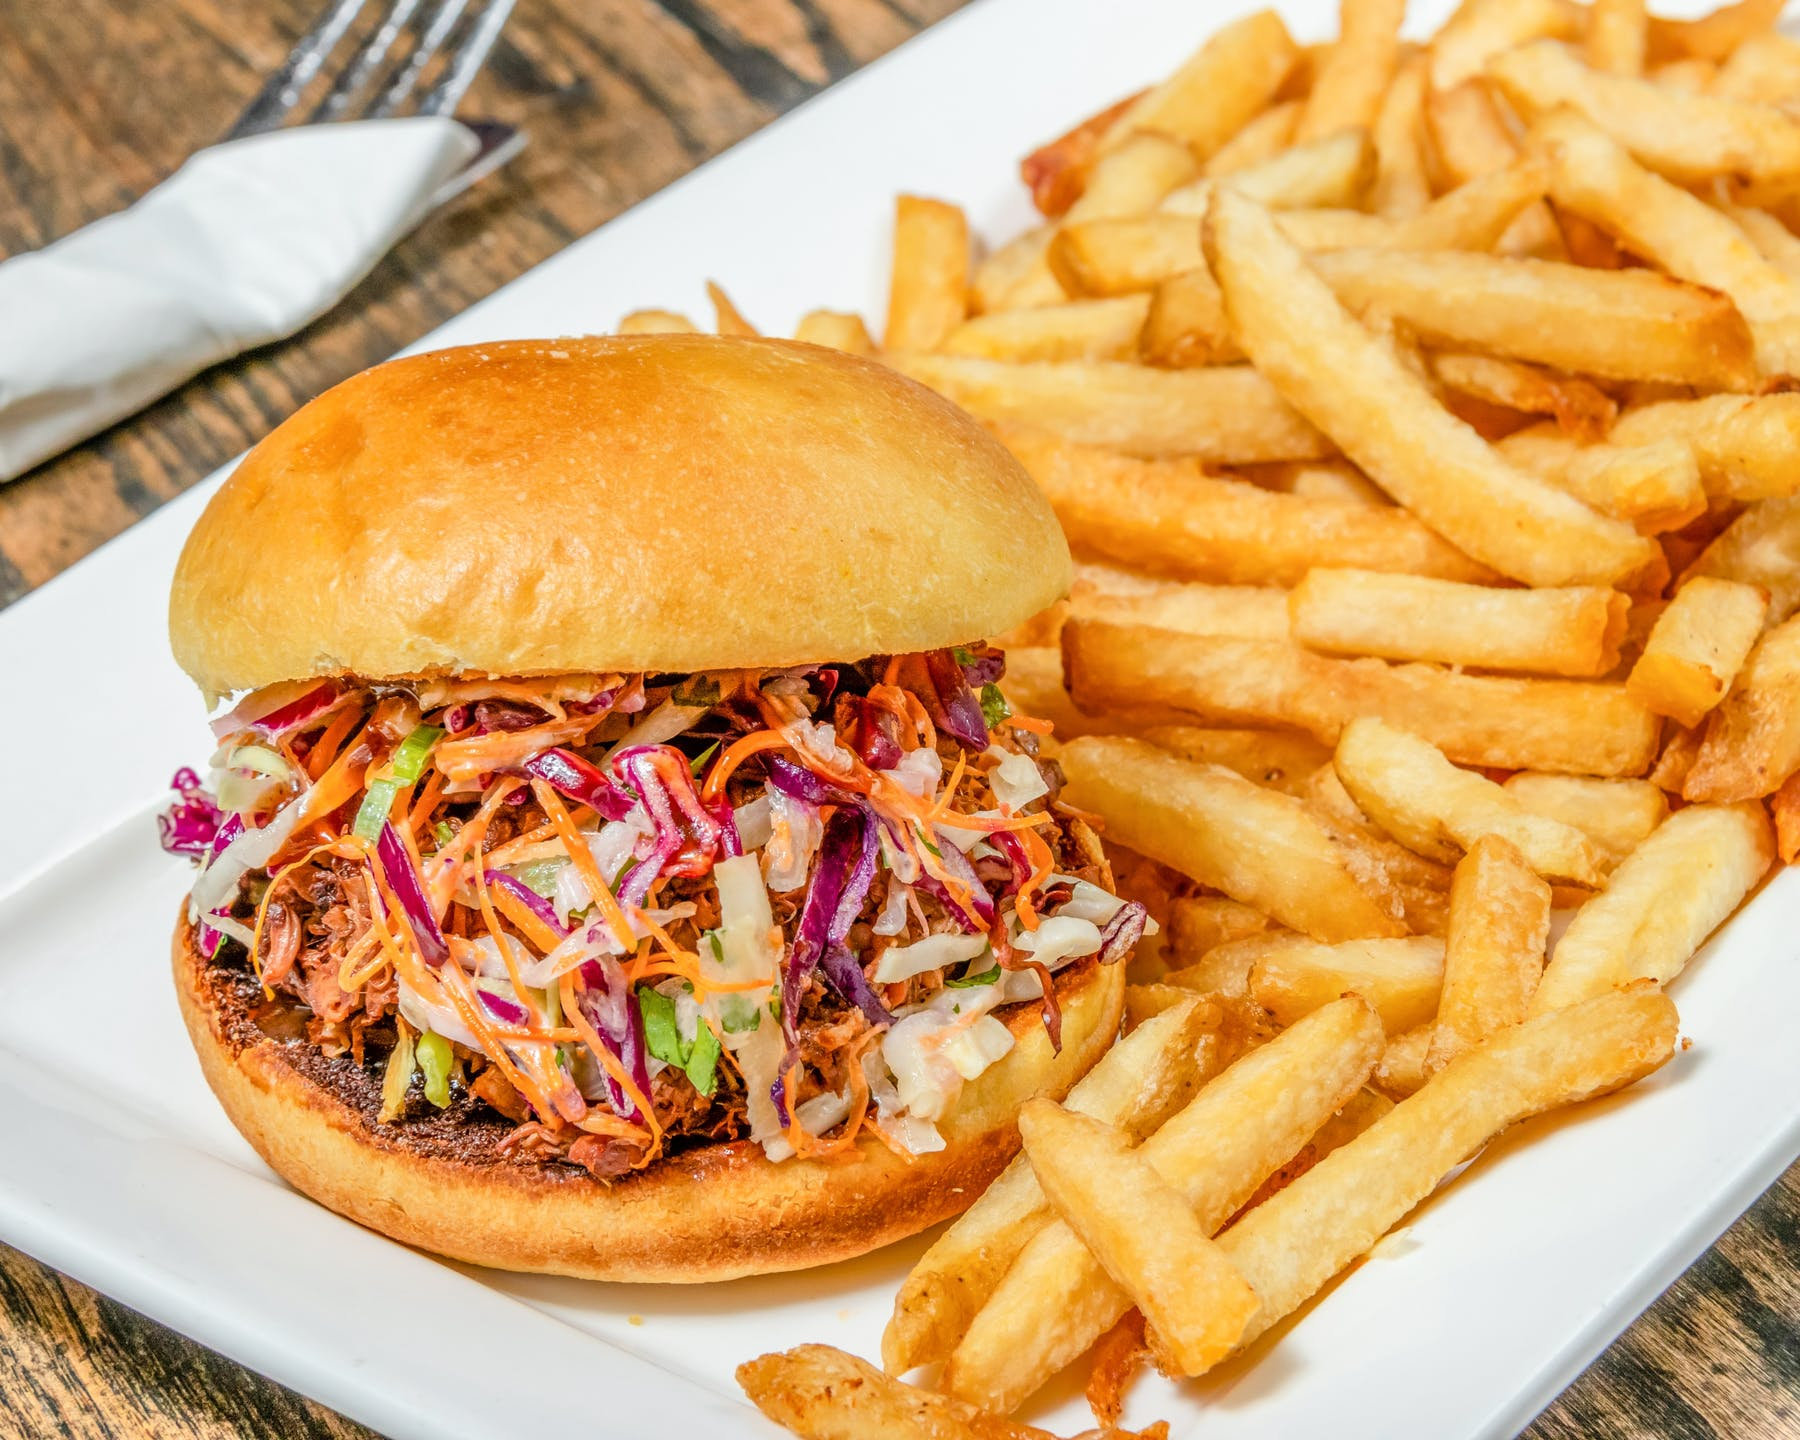 vegan pulled jackfruit sandwich with fries